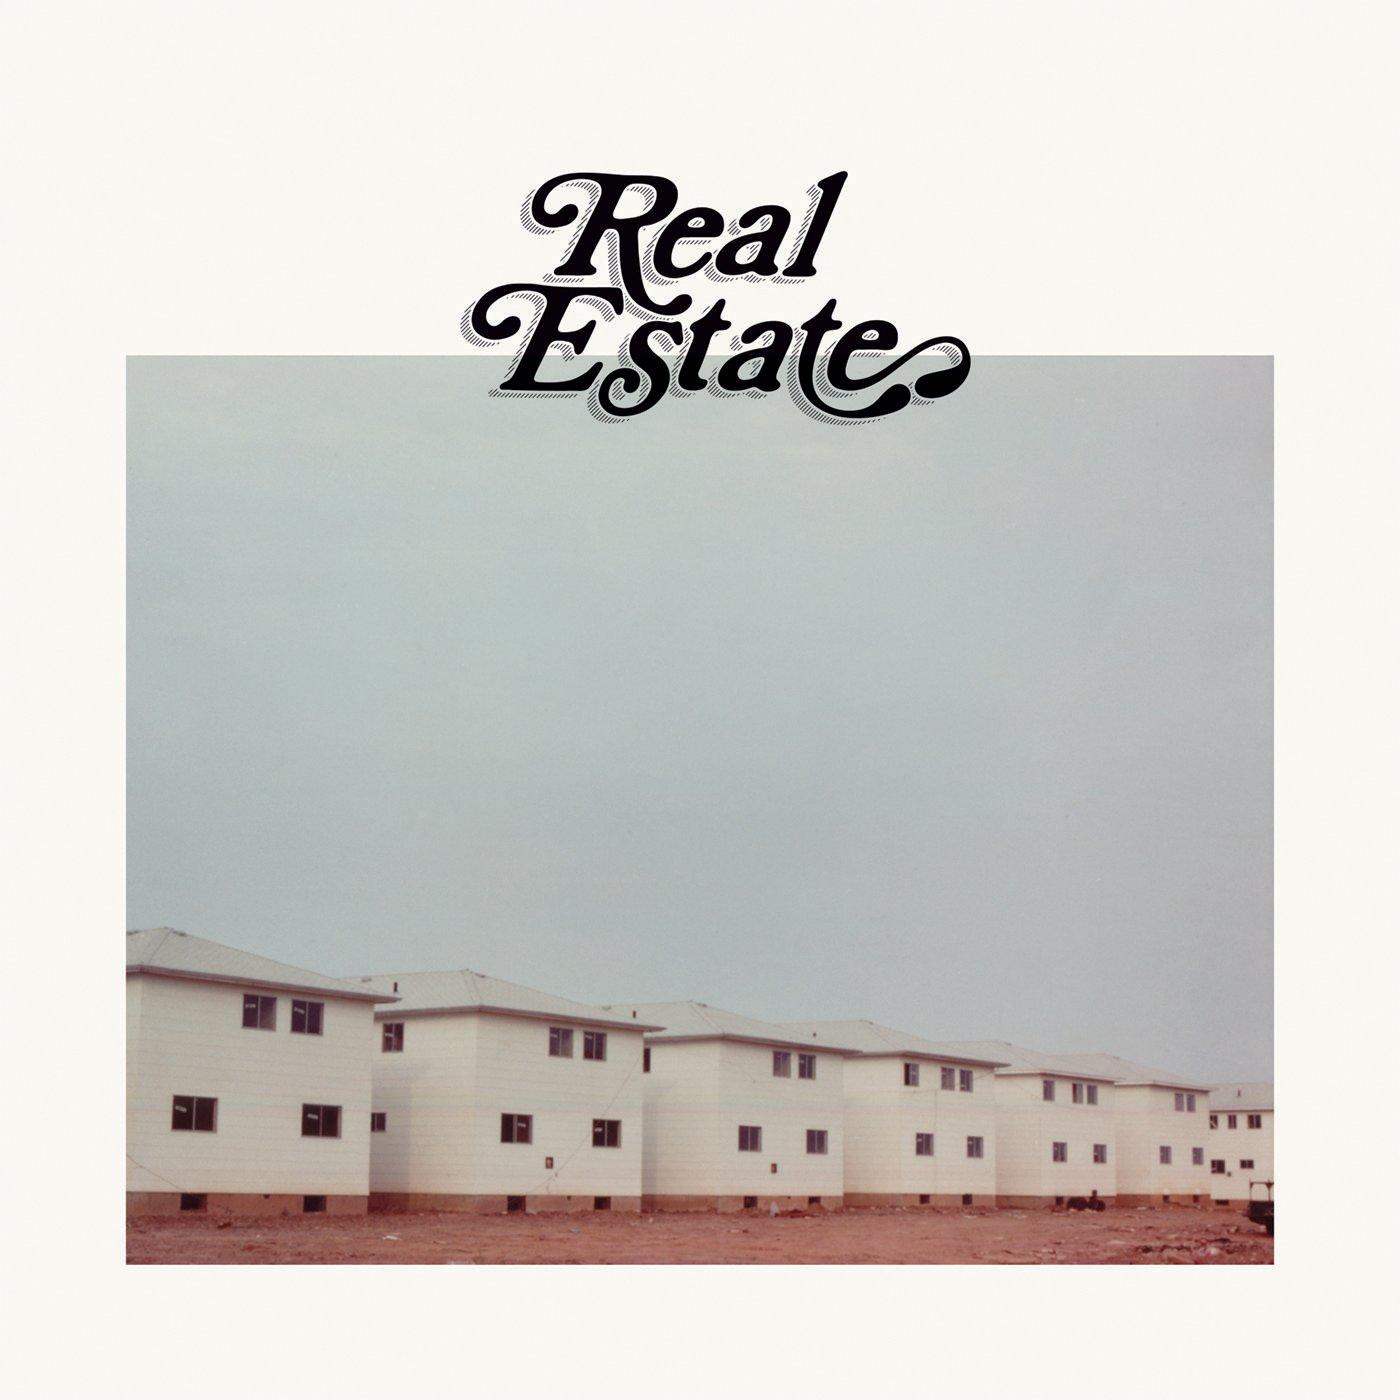 Real Estate, Days